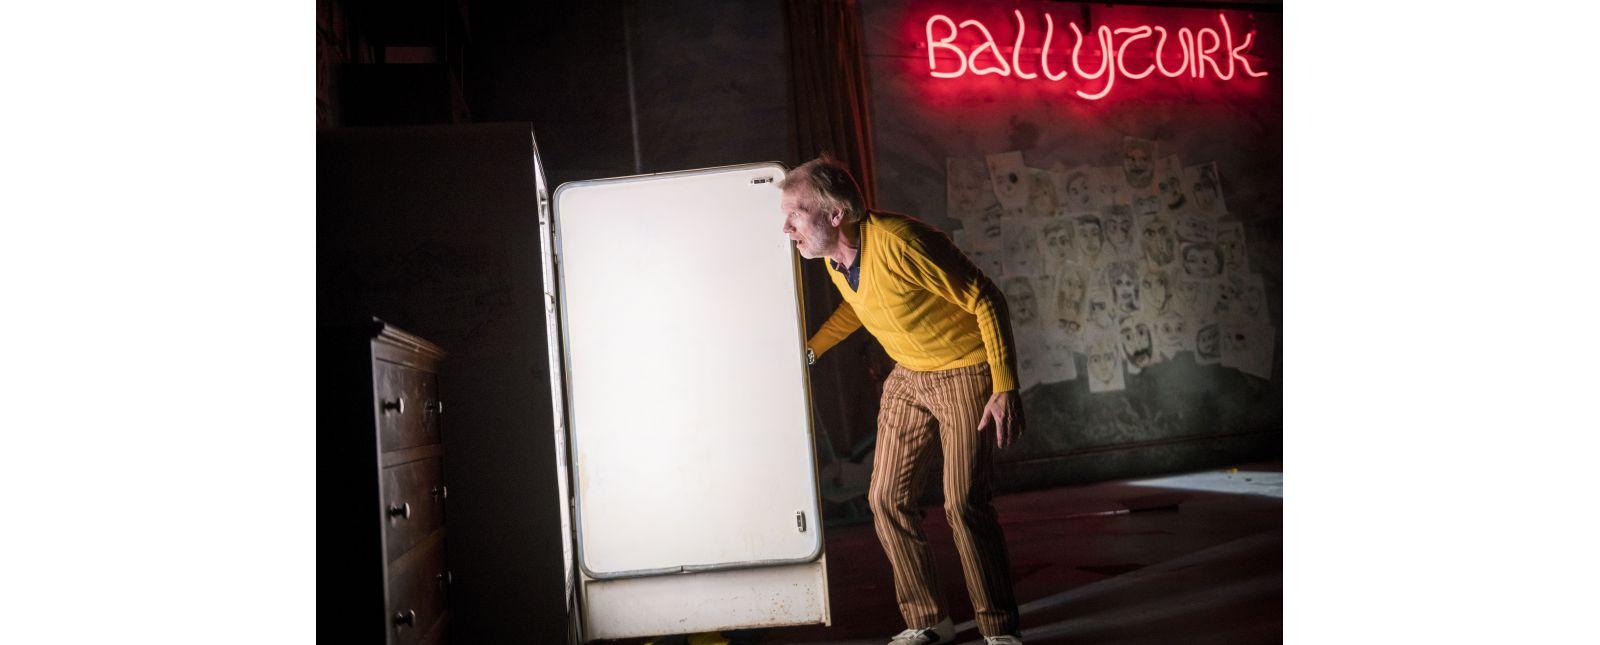 Ballyturk // Michael Witte // 2019 // Marc Doradzillo